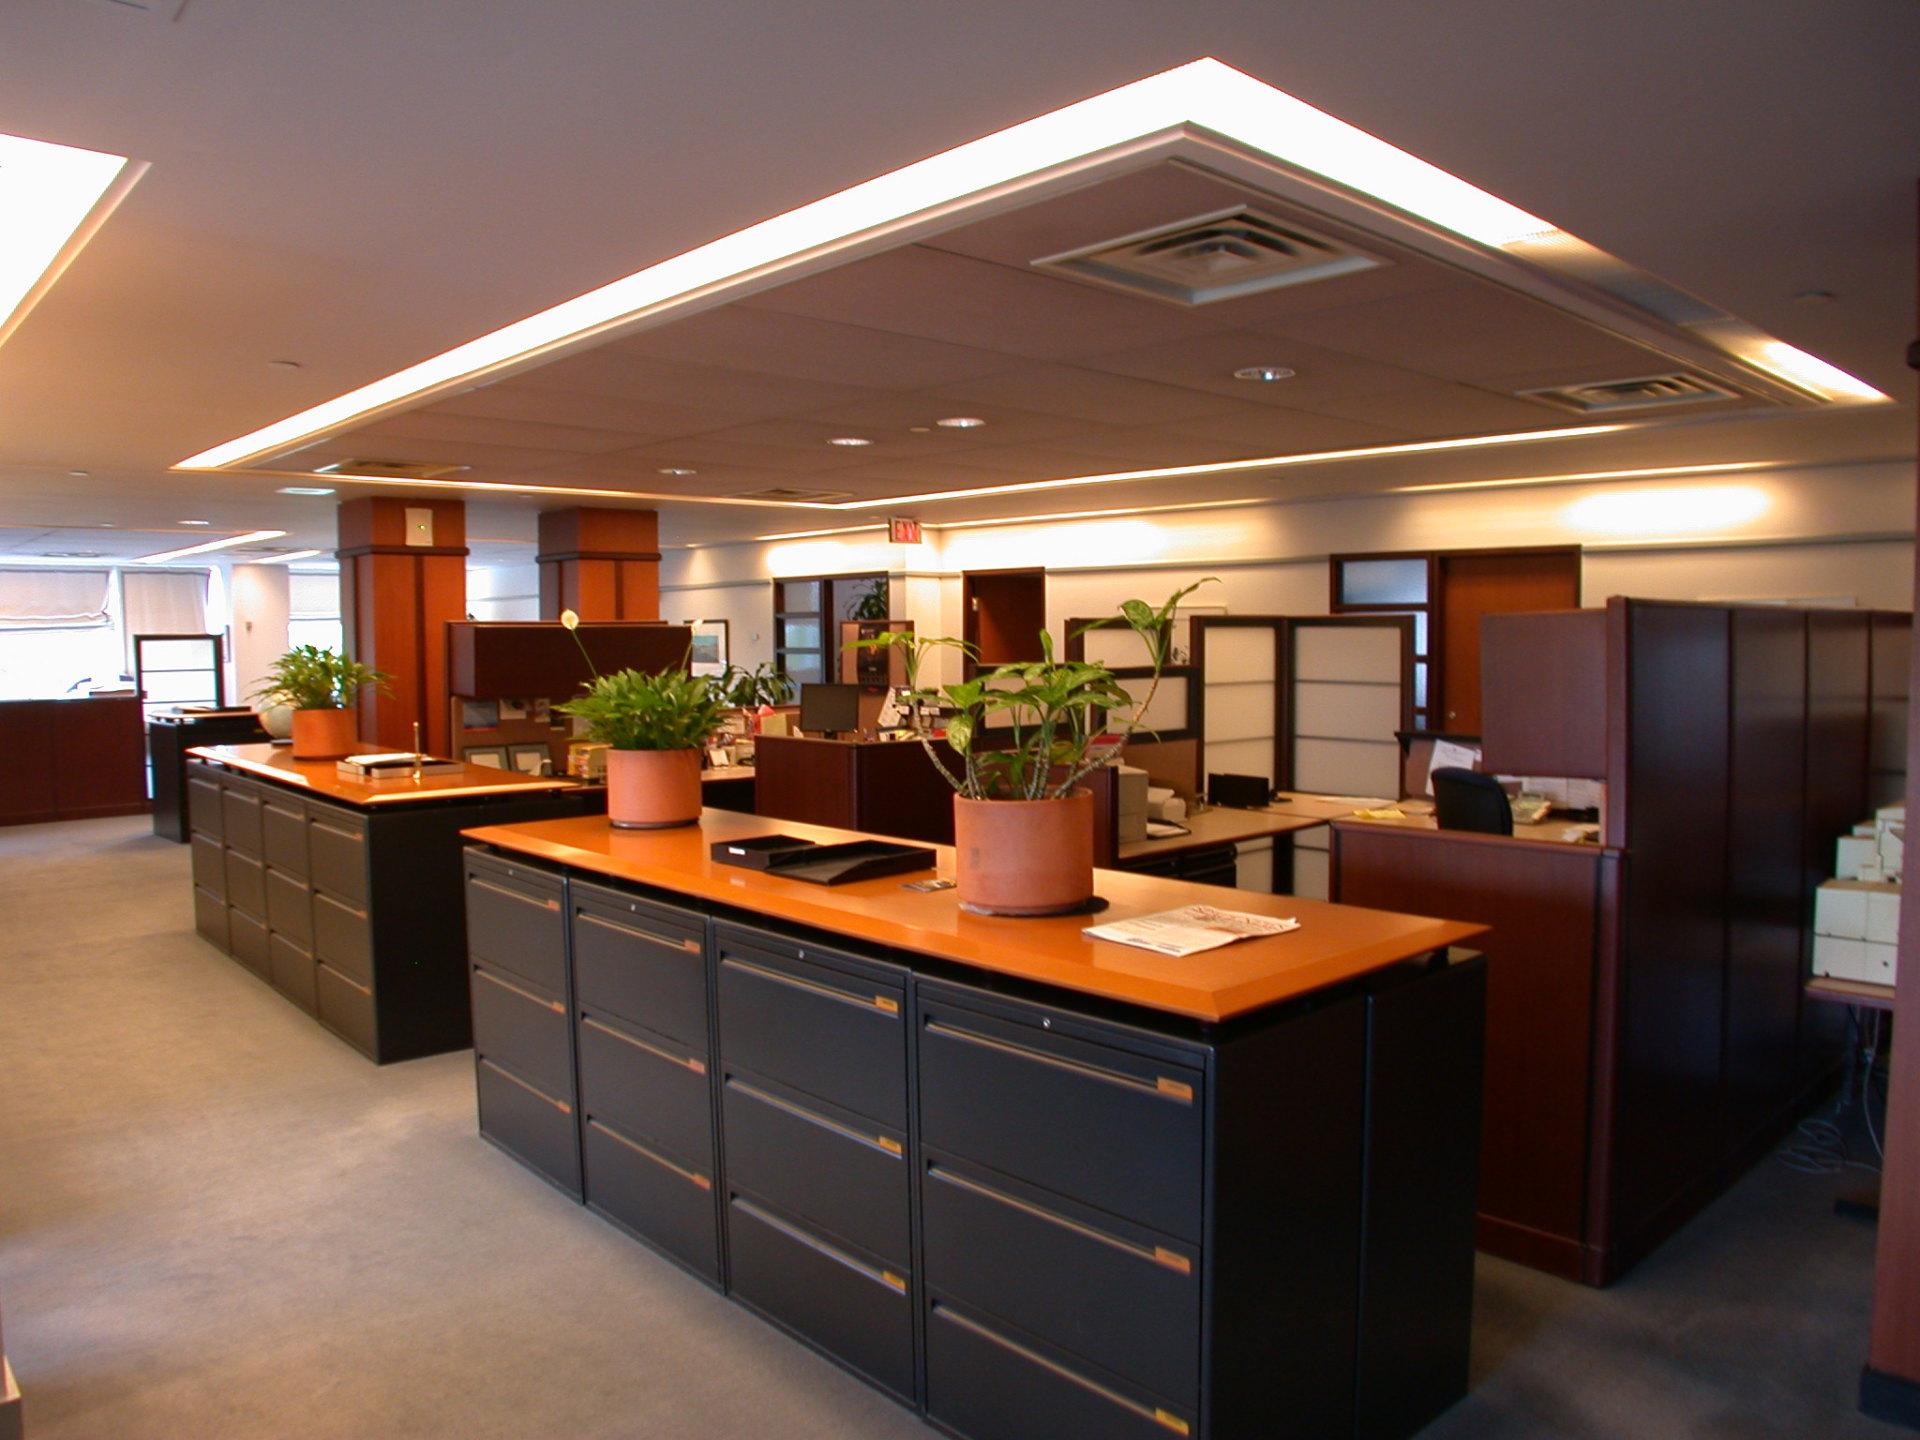 Telesat Canada consolidates premises at Blair Road facility...